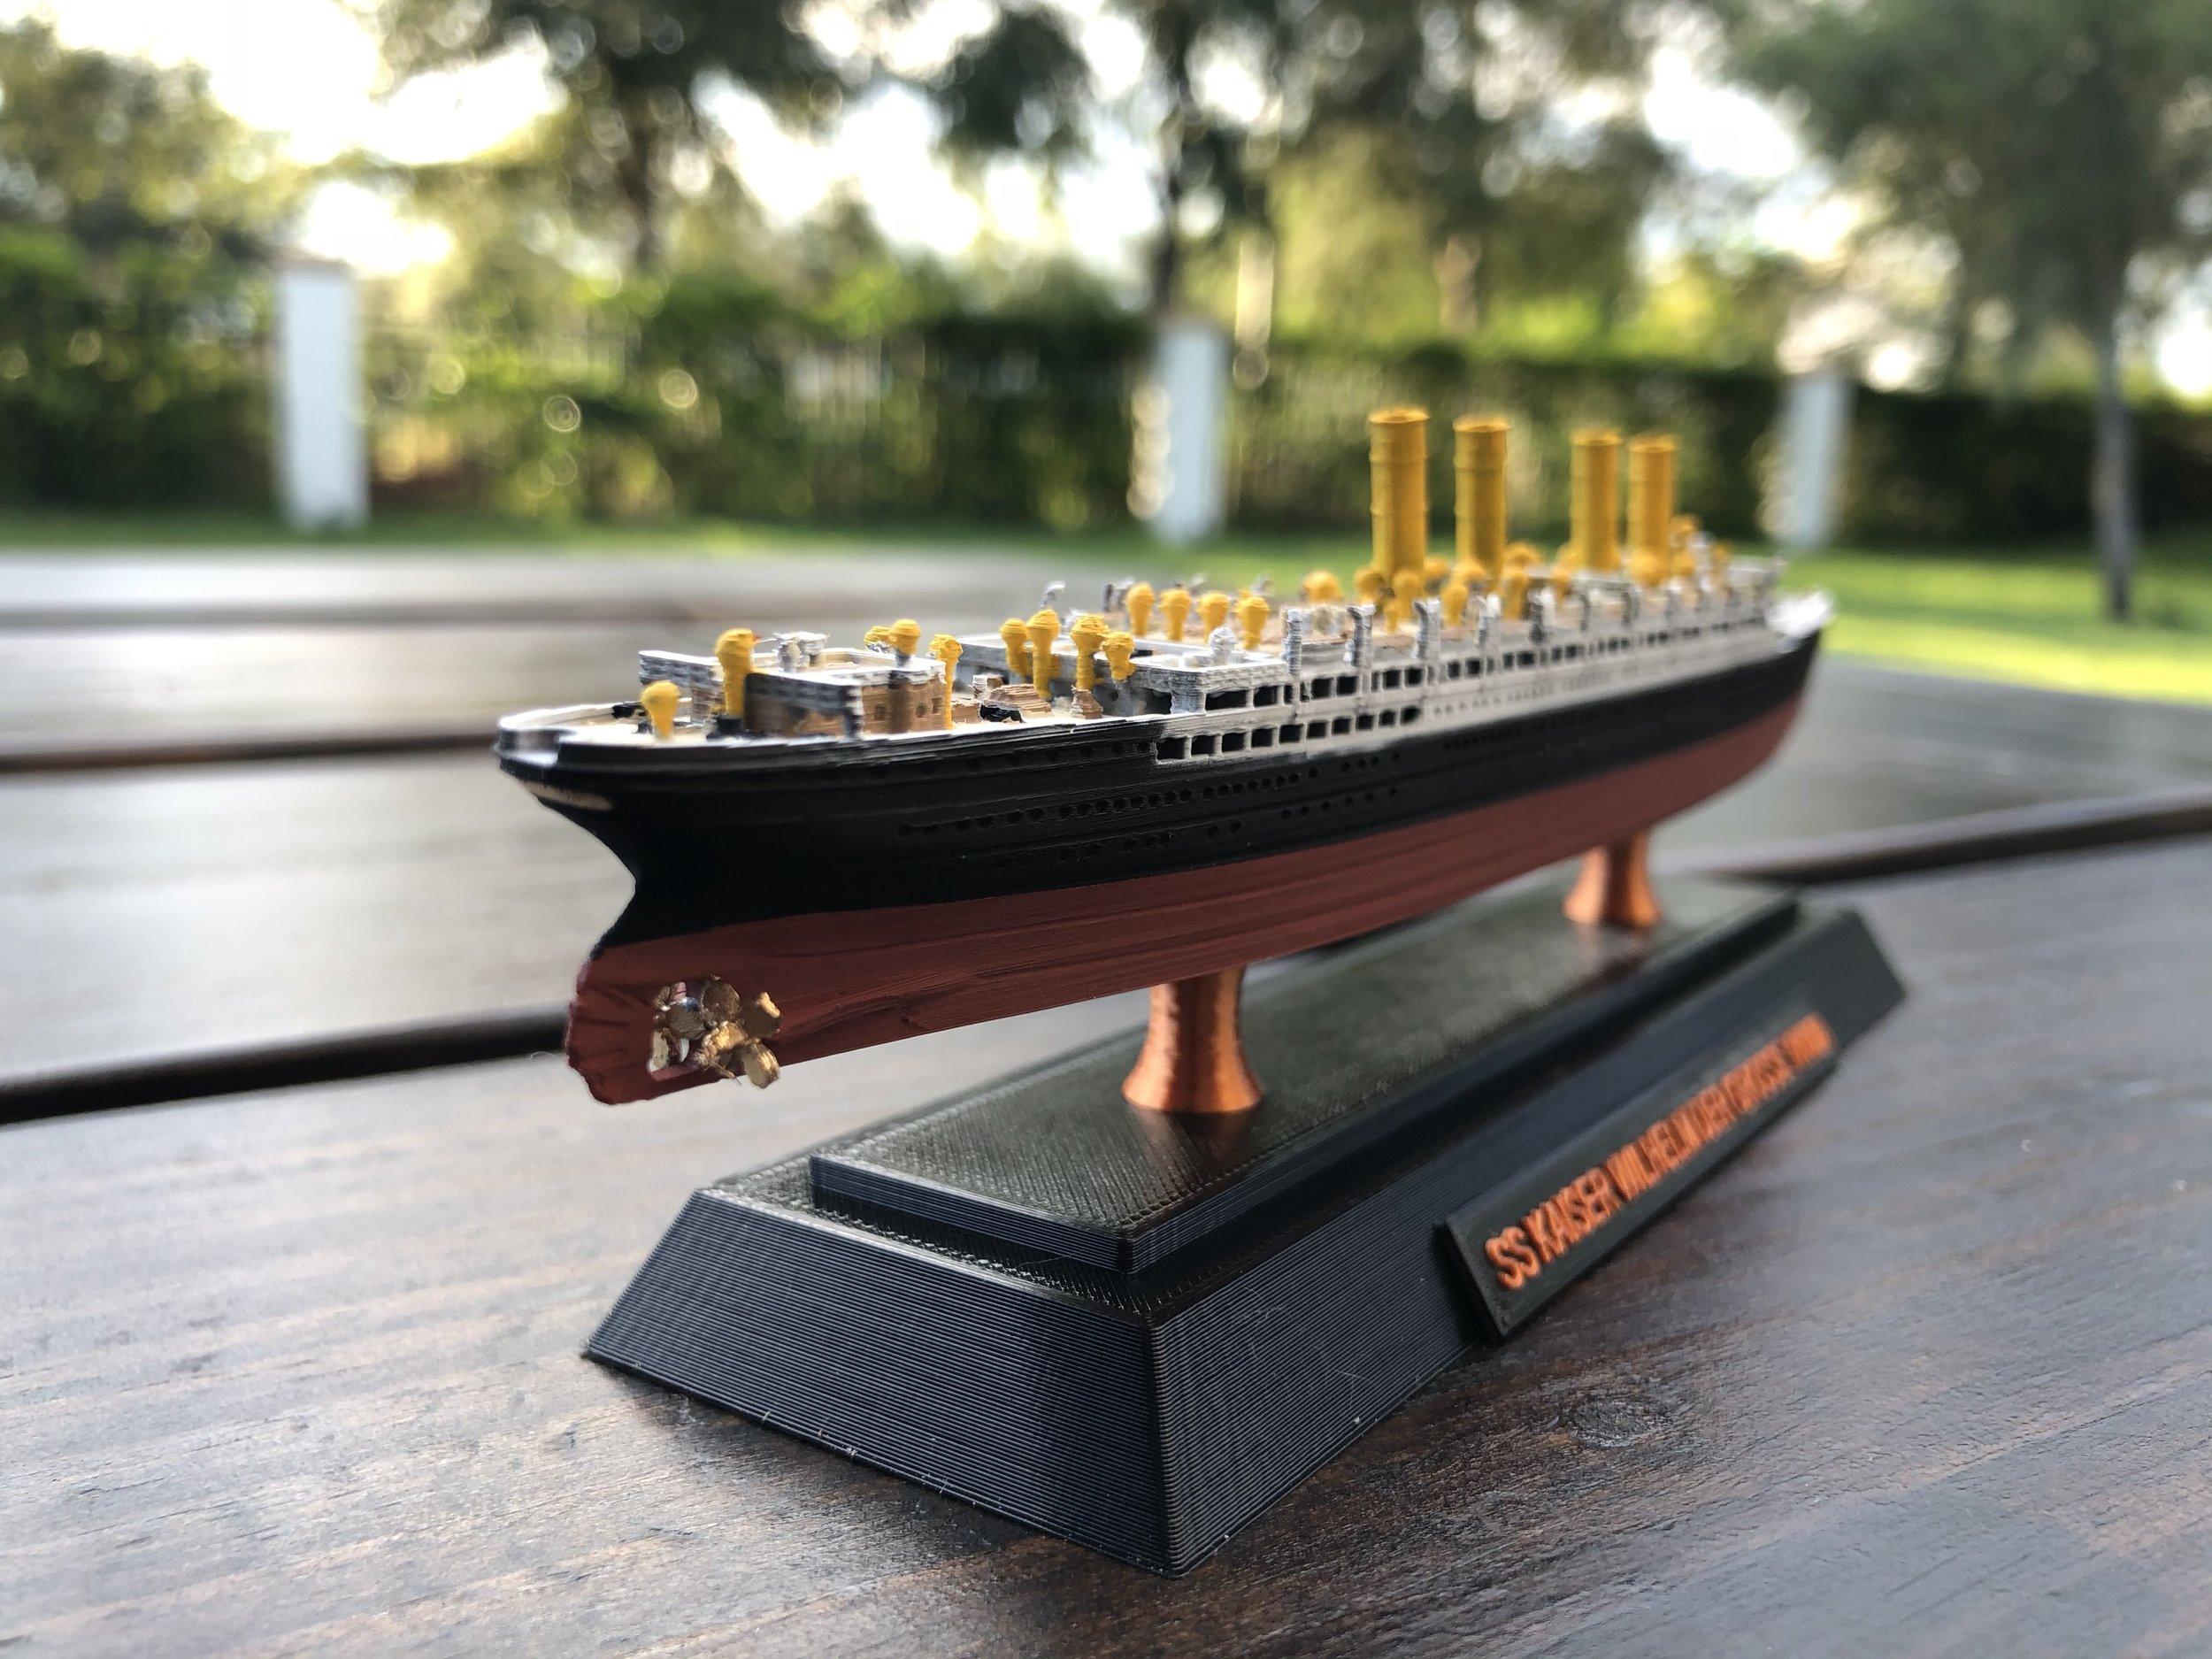 SS Kaiser Wilhelm der Grosse - Click for details